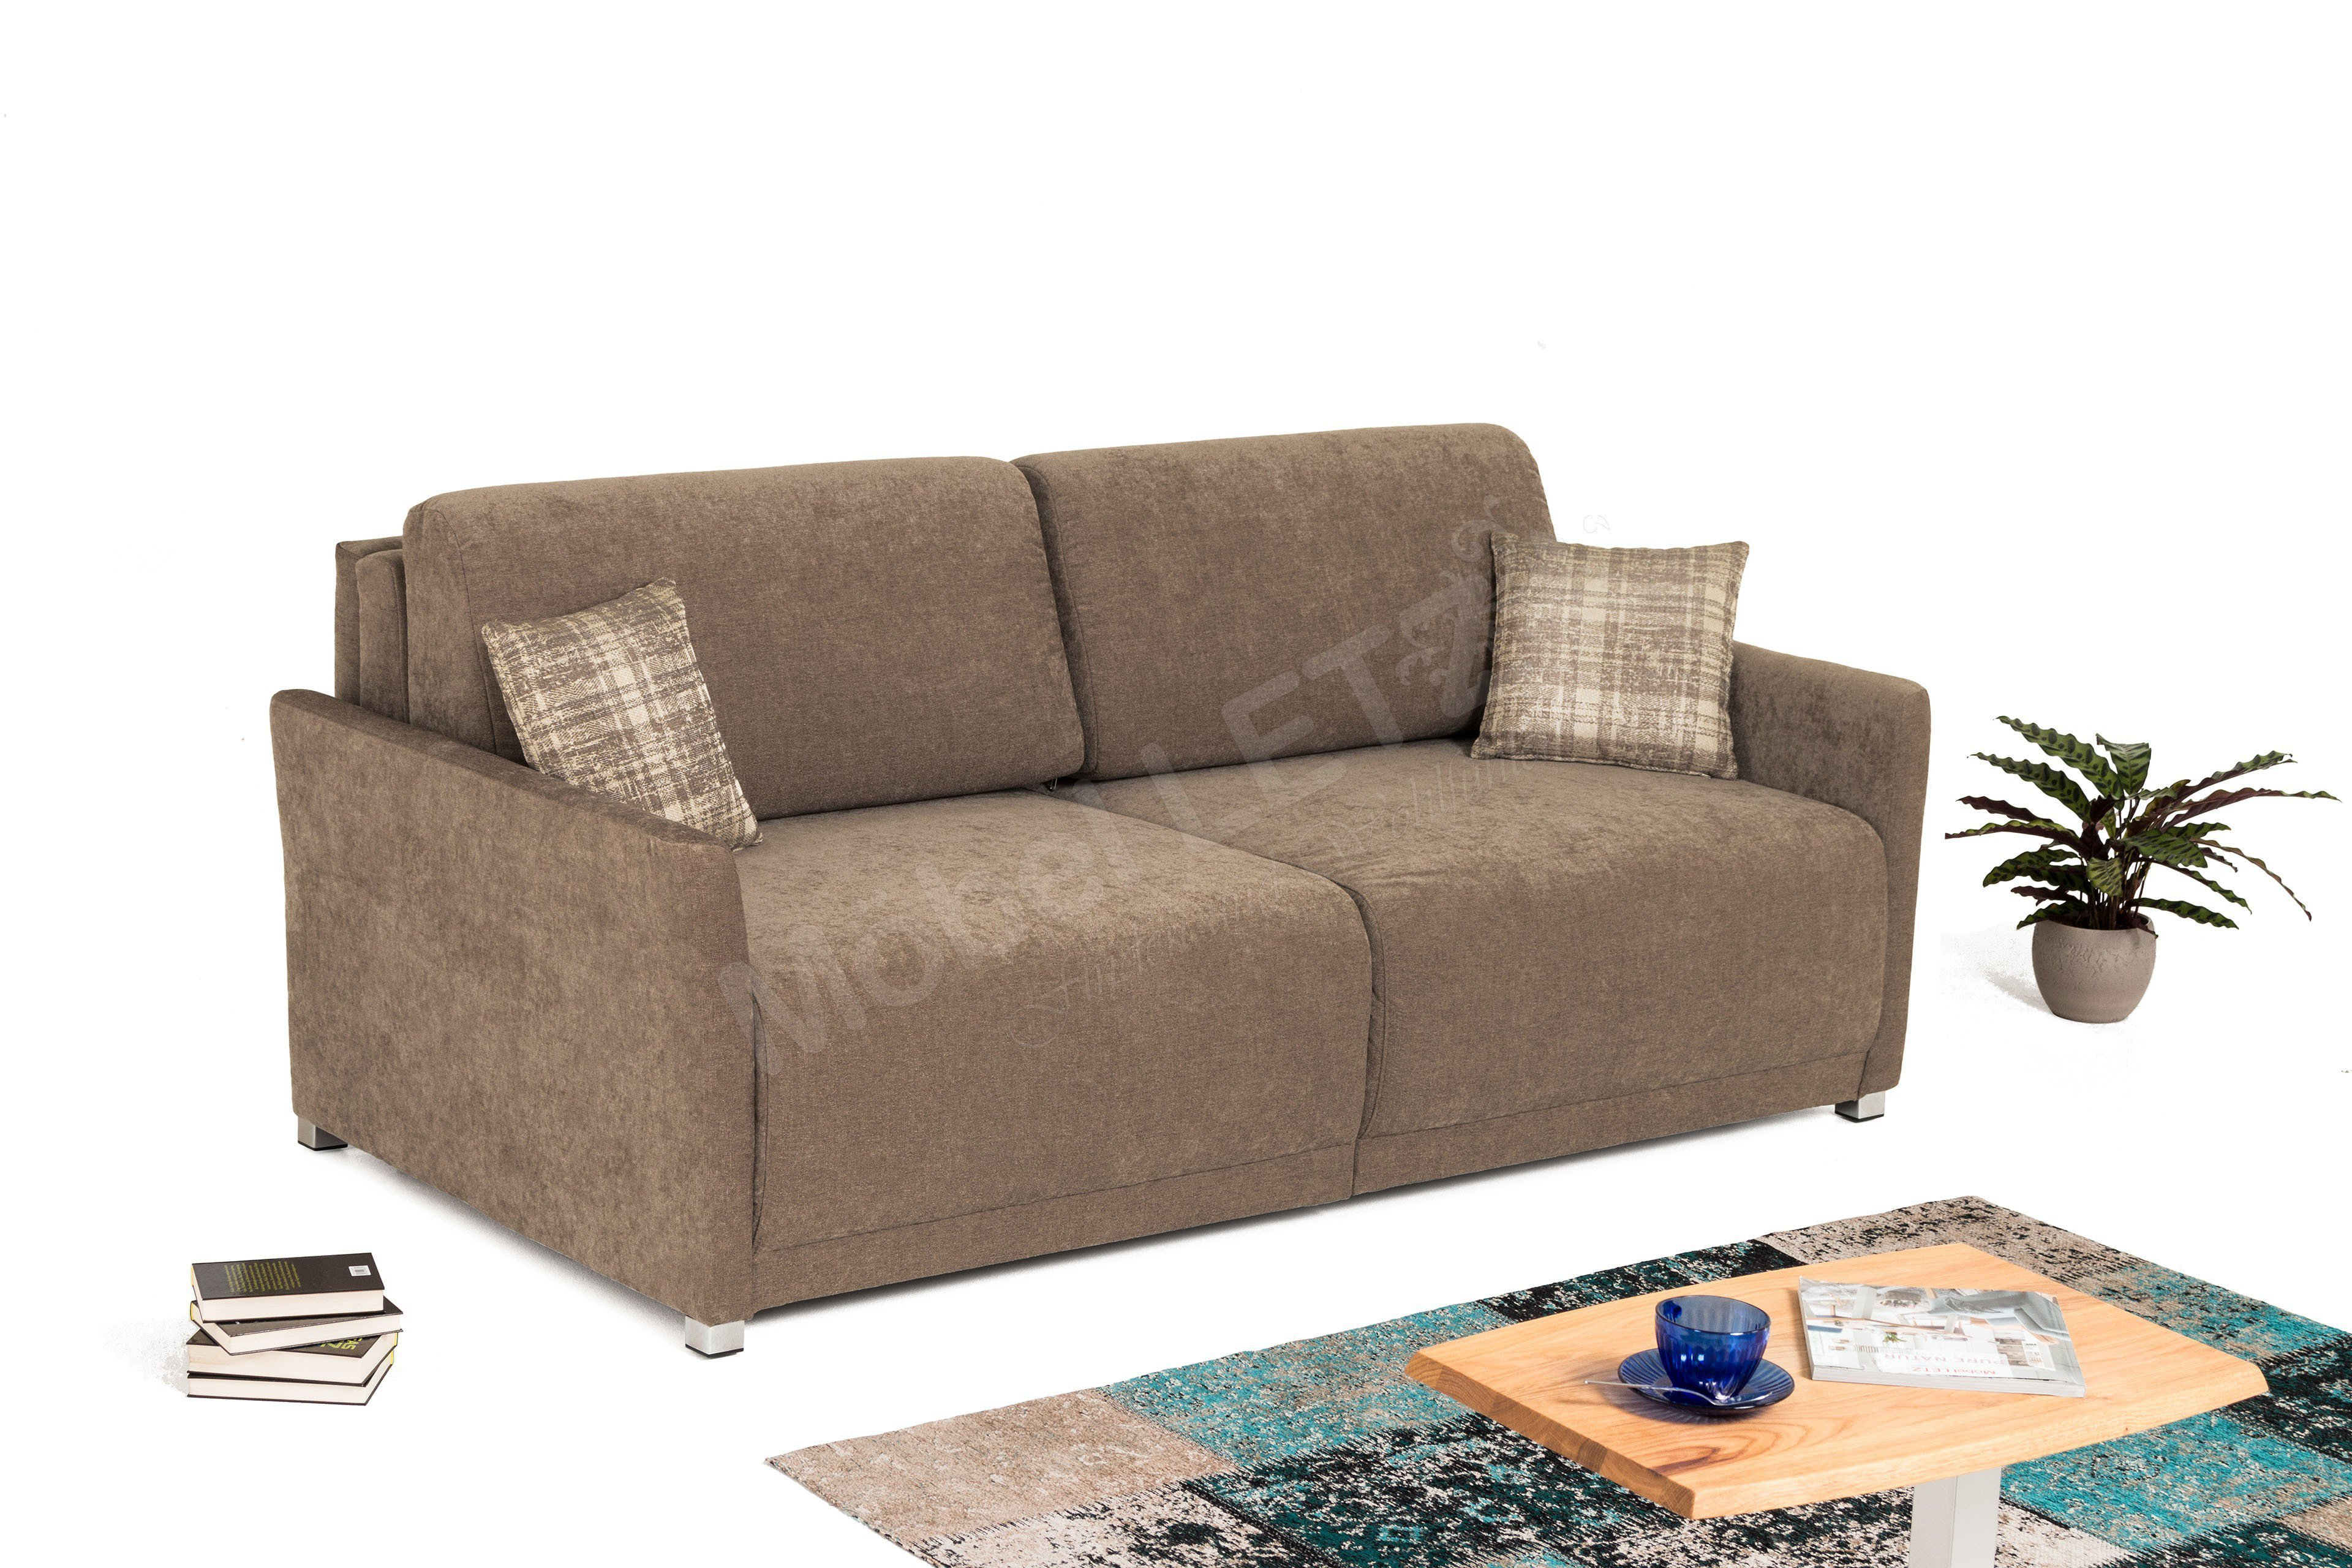 l schlafsofa trendy canap droit bellini hour sans. Black Bedroom Furniture Sets. Home Design Ideas